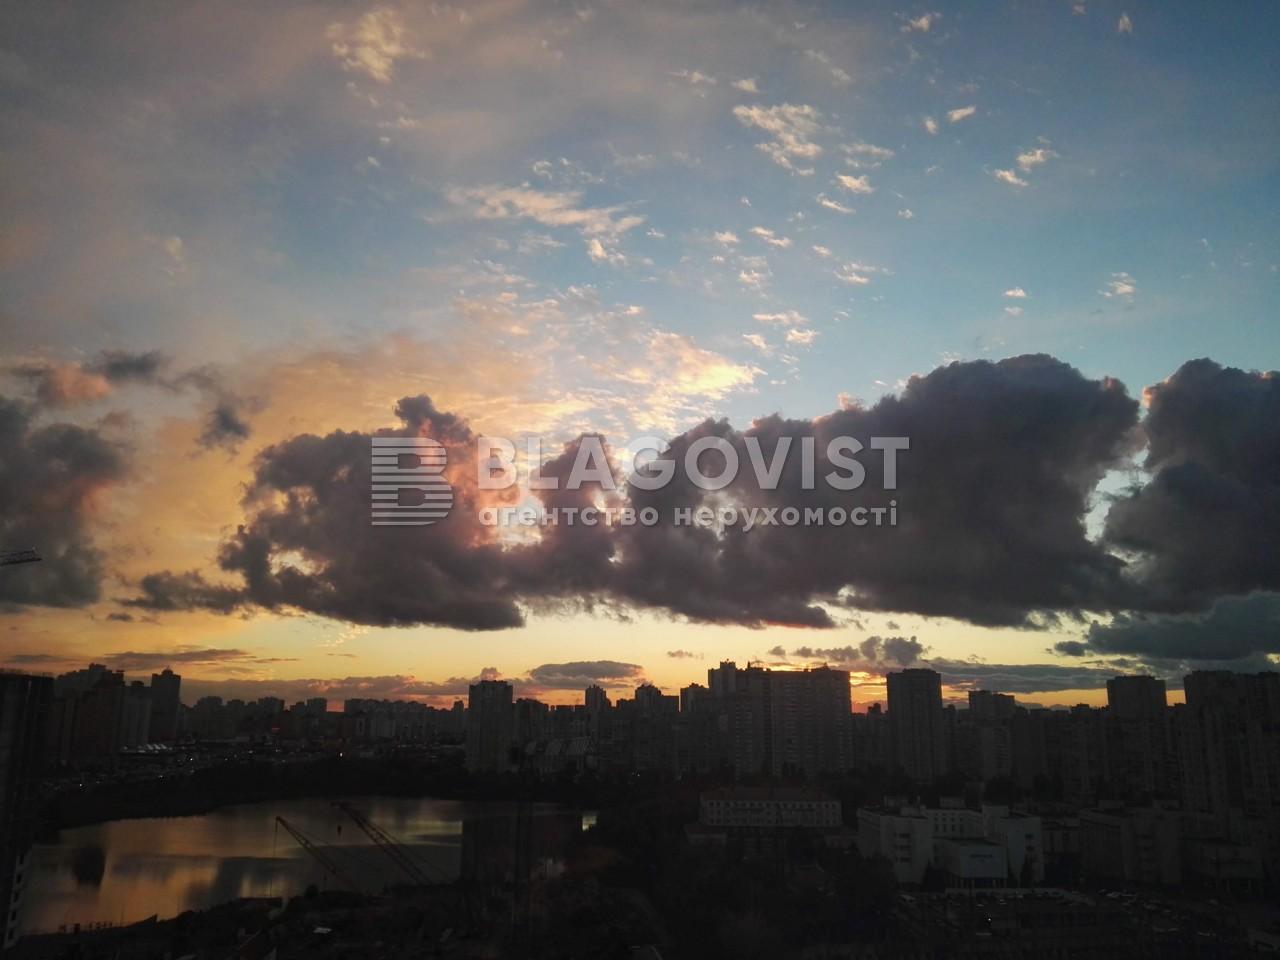 Квартира R-21445, Декабристов, 12/37, Киев - Фото 17